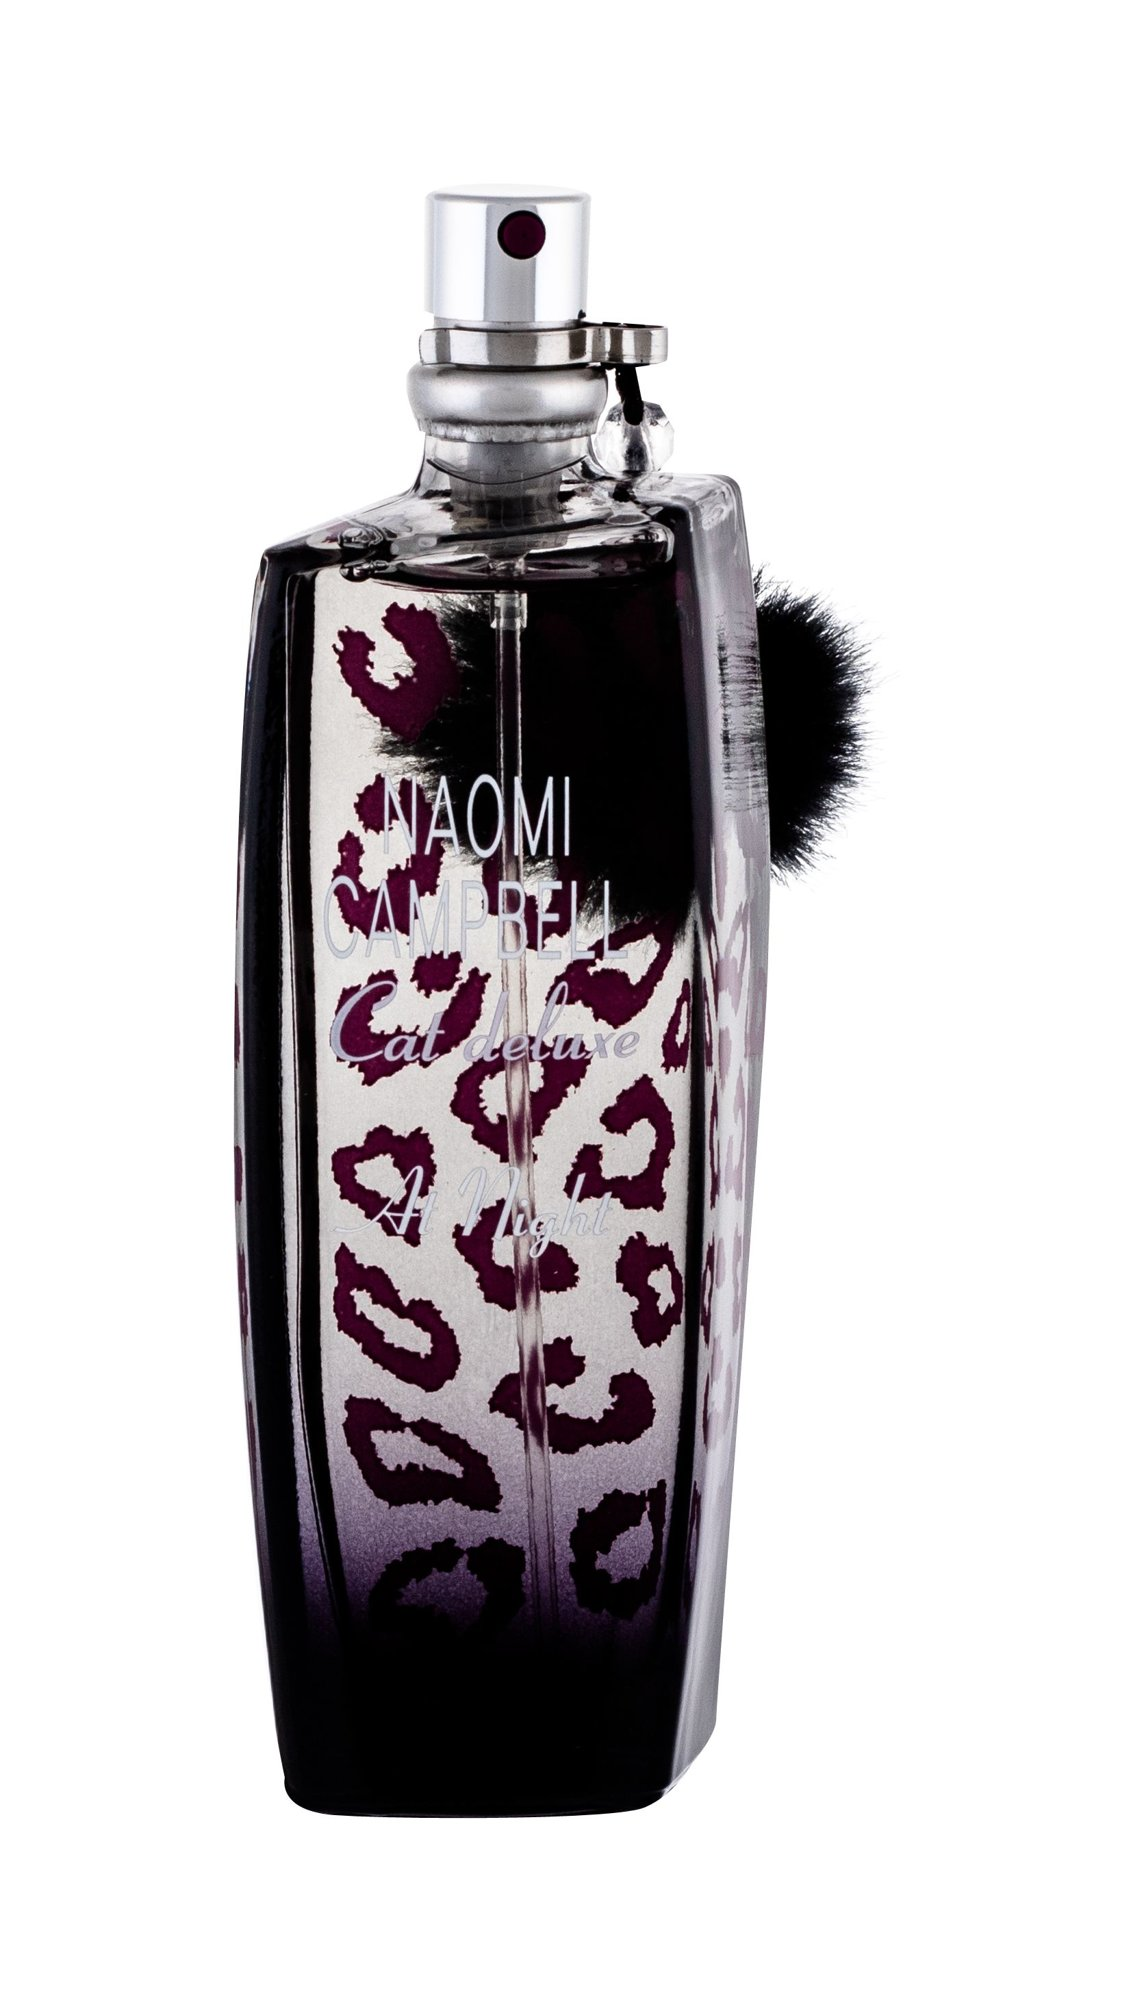 Naomi Campbell Cat Deluxe Eau de Toilette 30ml  At Night